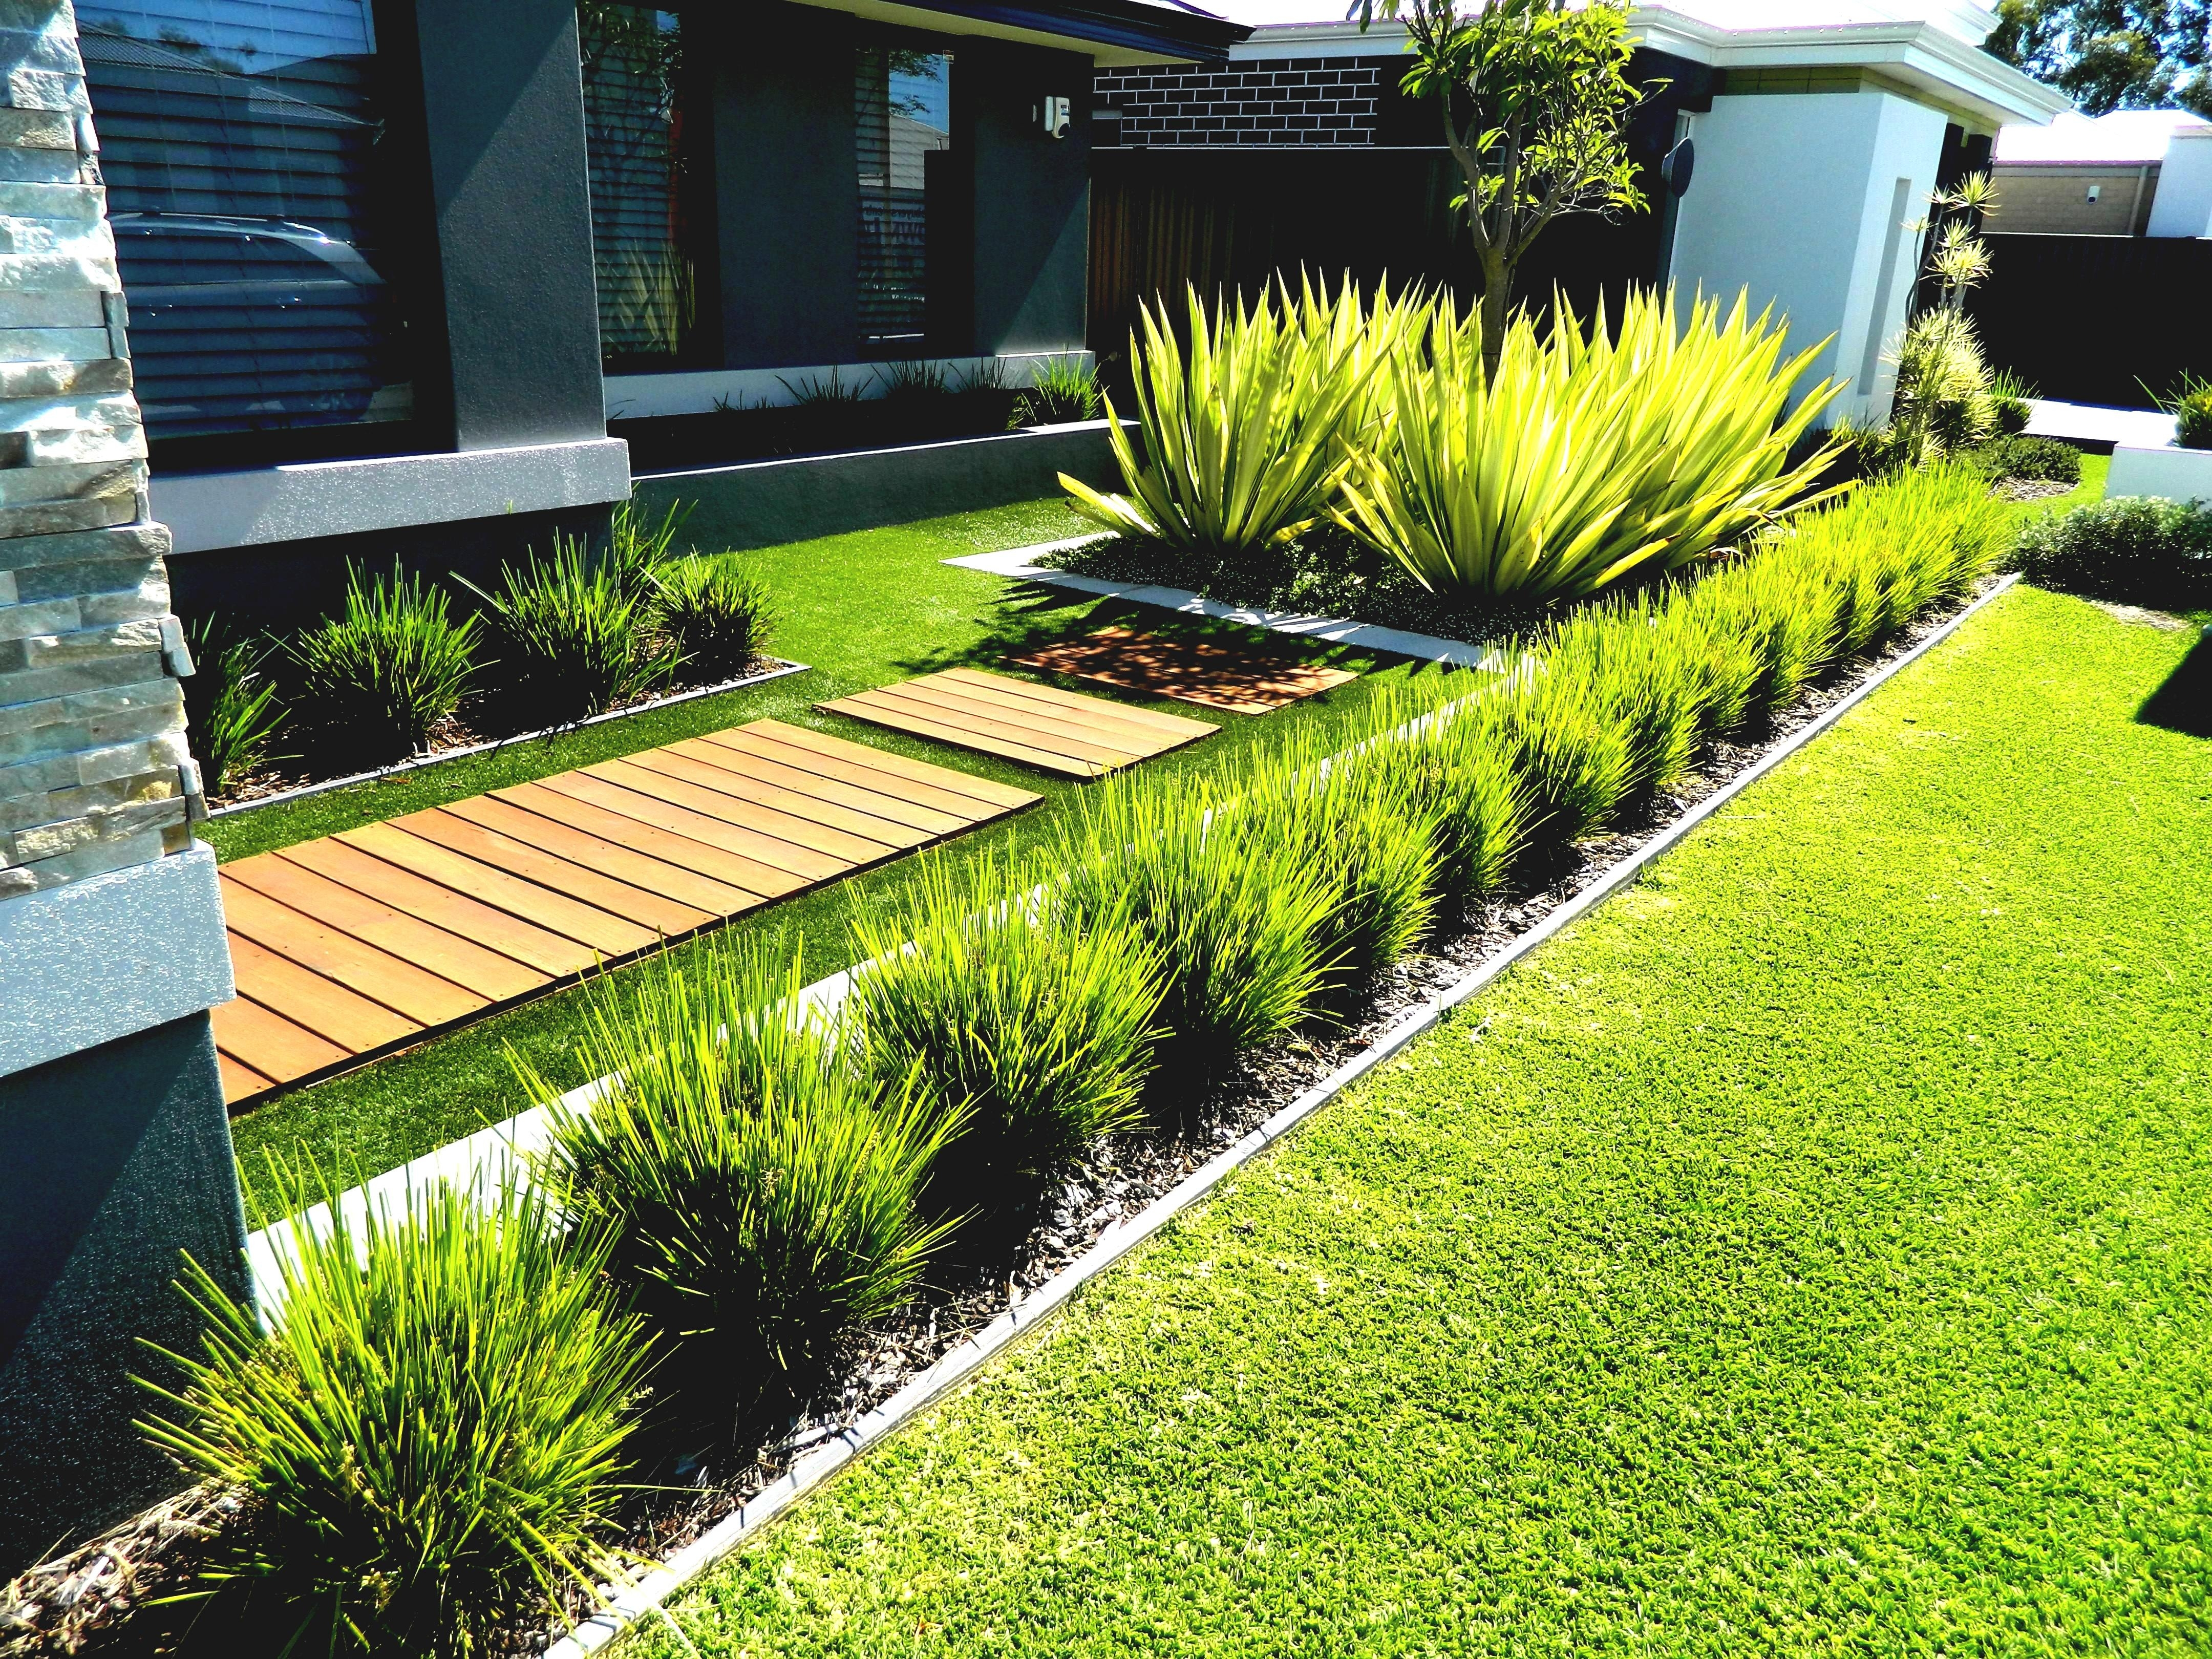 8 Luxurius Simple Landscaping Ideas Pictures